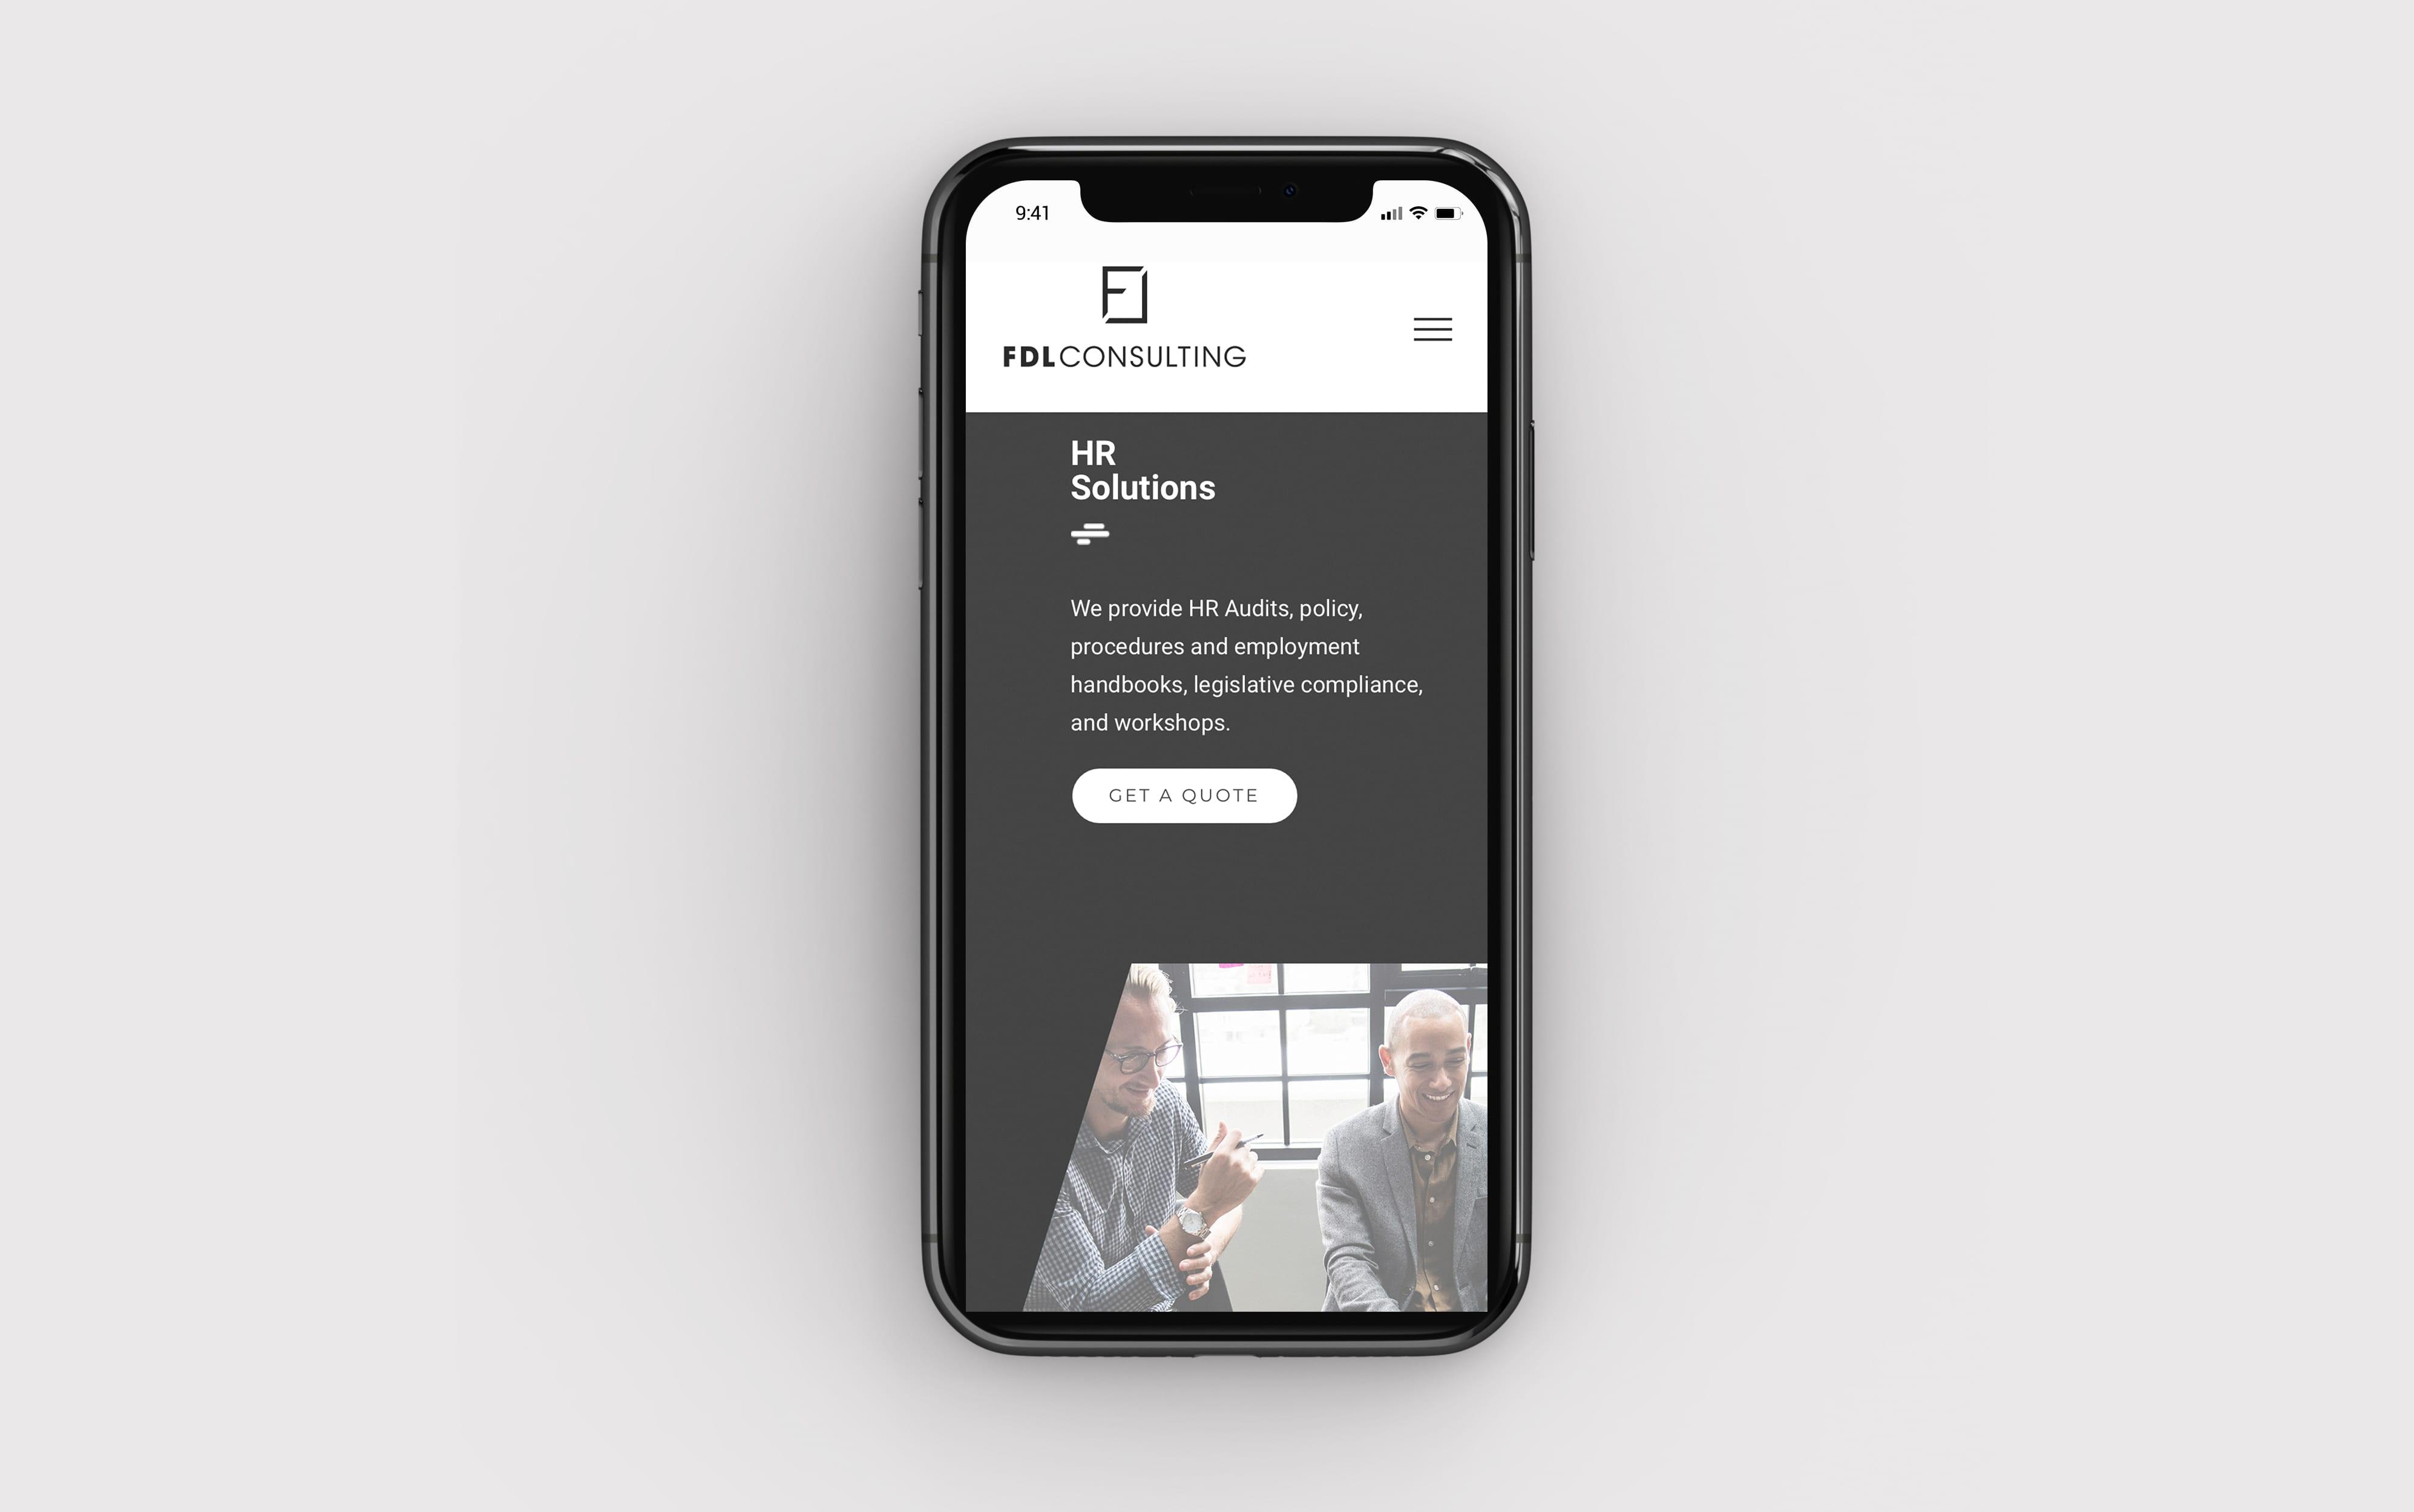 fdl consulting responsive design